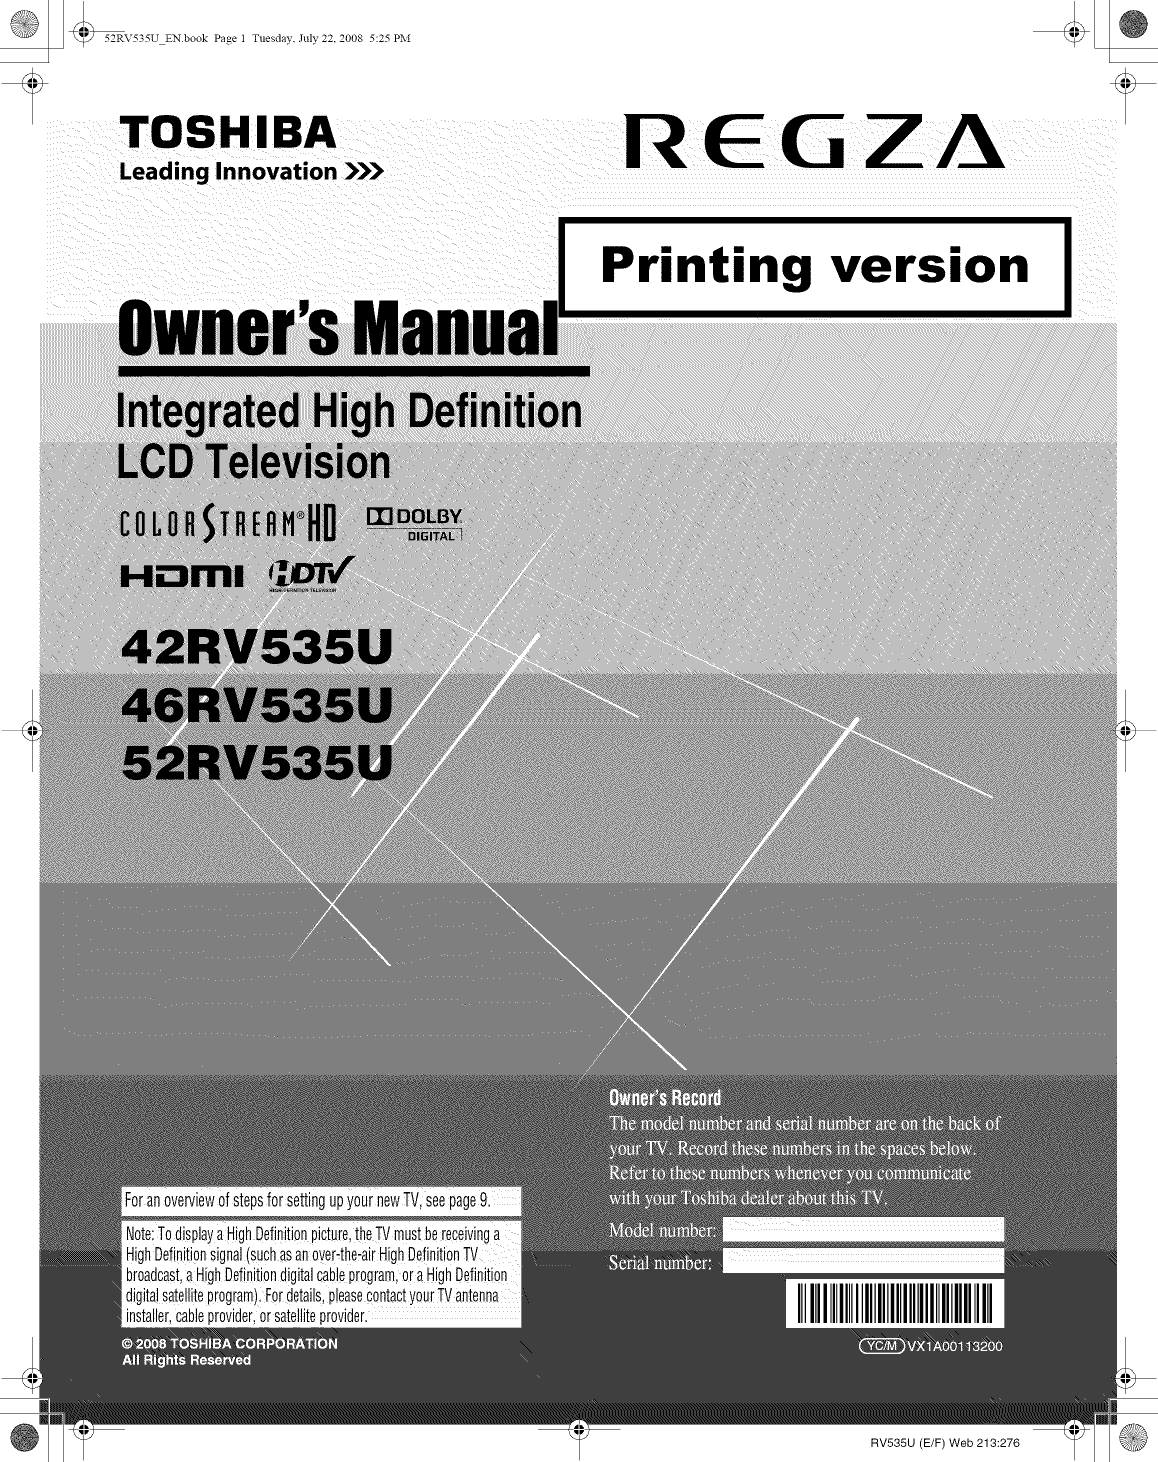 Toshiba 42rv535u User Manual Tv Lcd Manuals And Guides L0811036